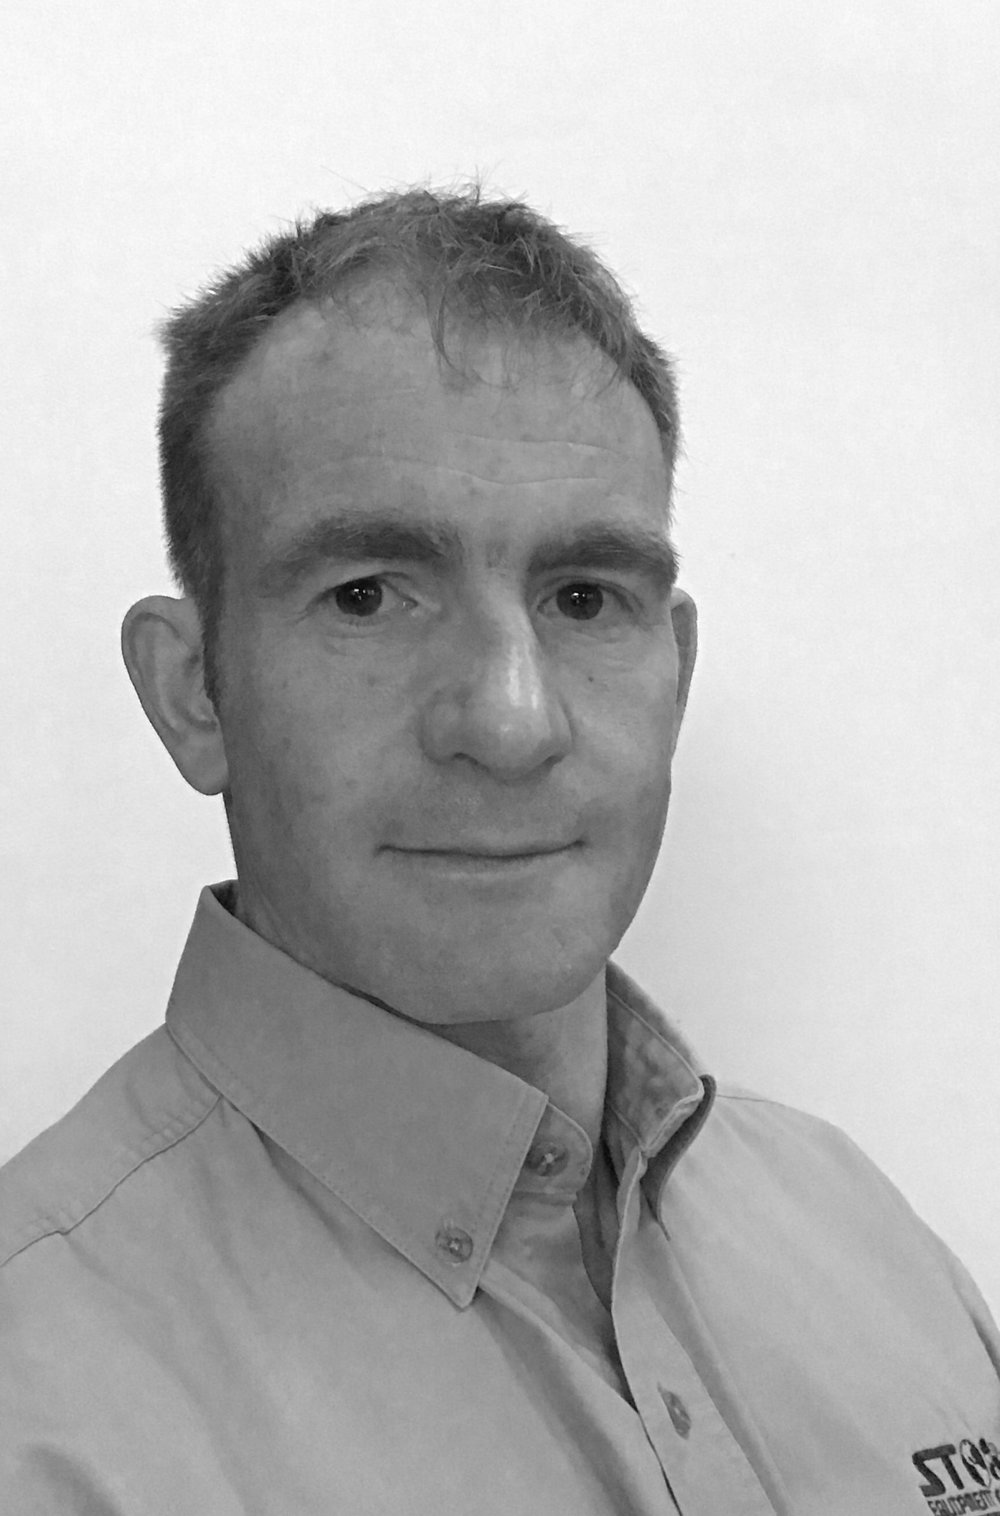 MR. LEWIS BAKER, EUROPEAN TECHNICAL SUPPORT MANAGER, ST EQUIPMENT & TECHNOLOGY